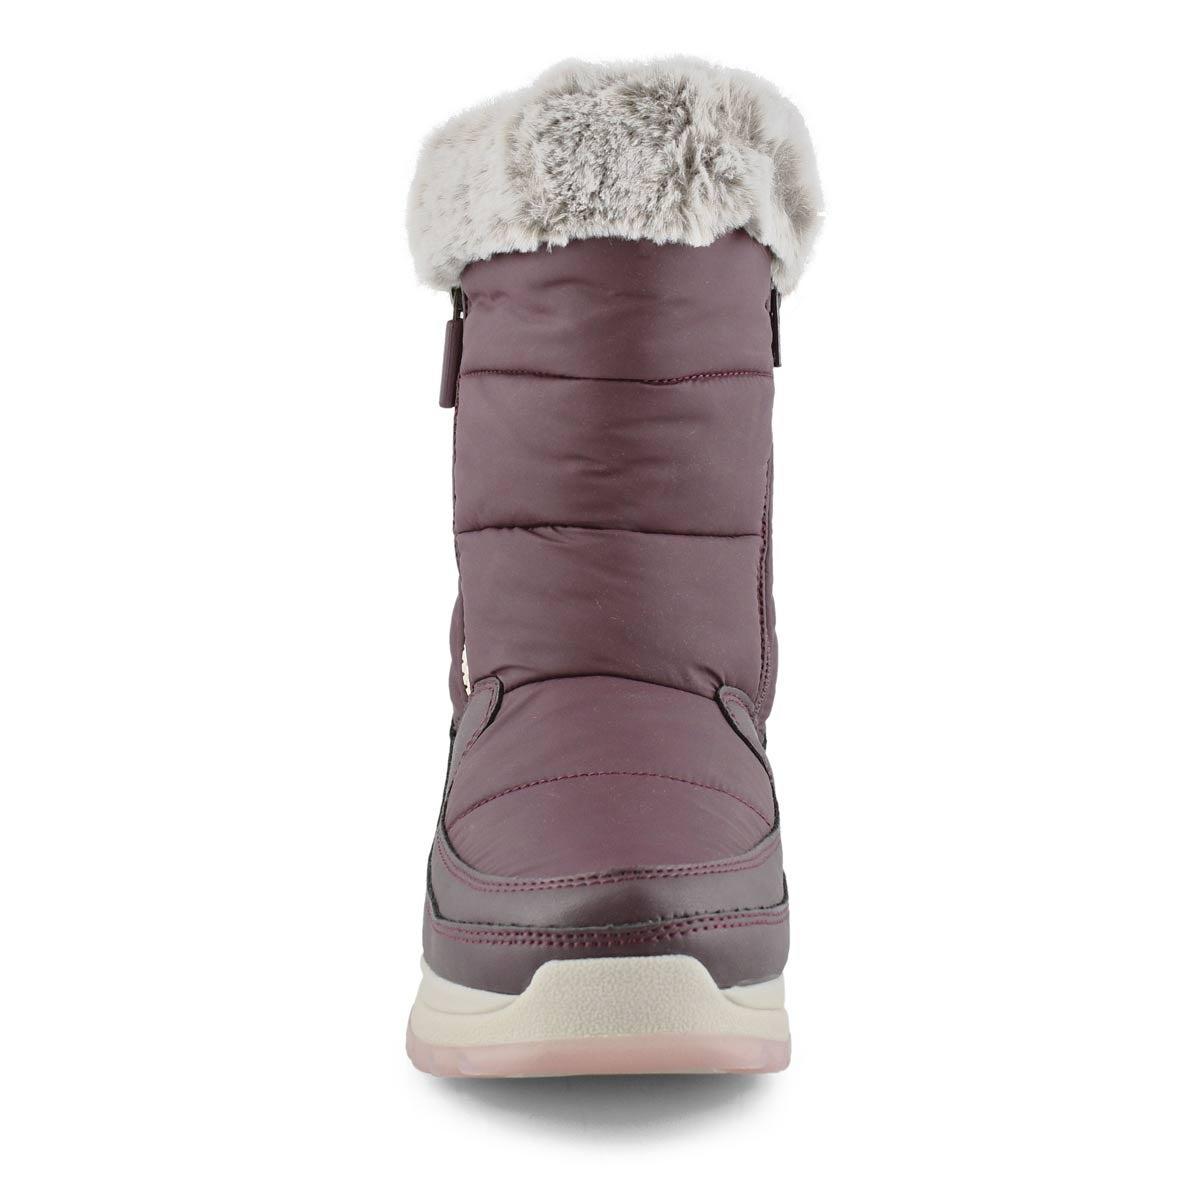 Women's SEISMIC burgundy waterproof winter boots